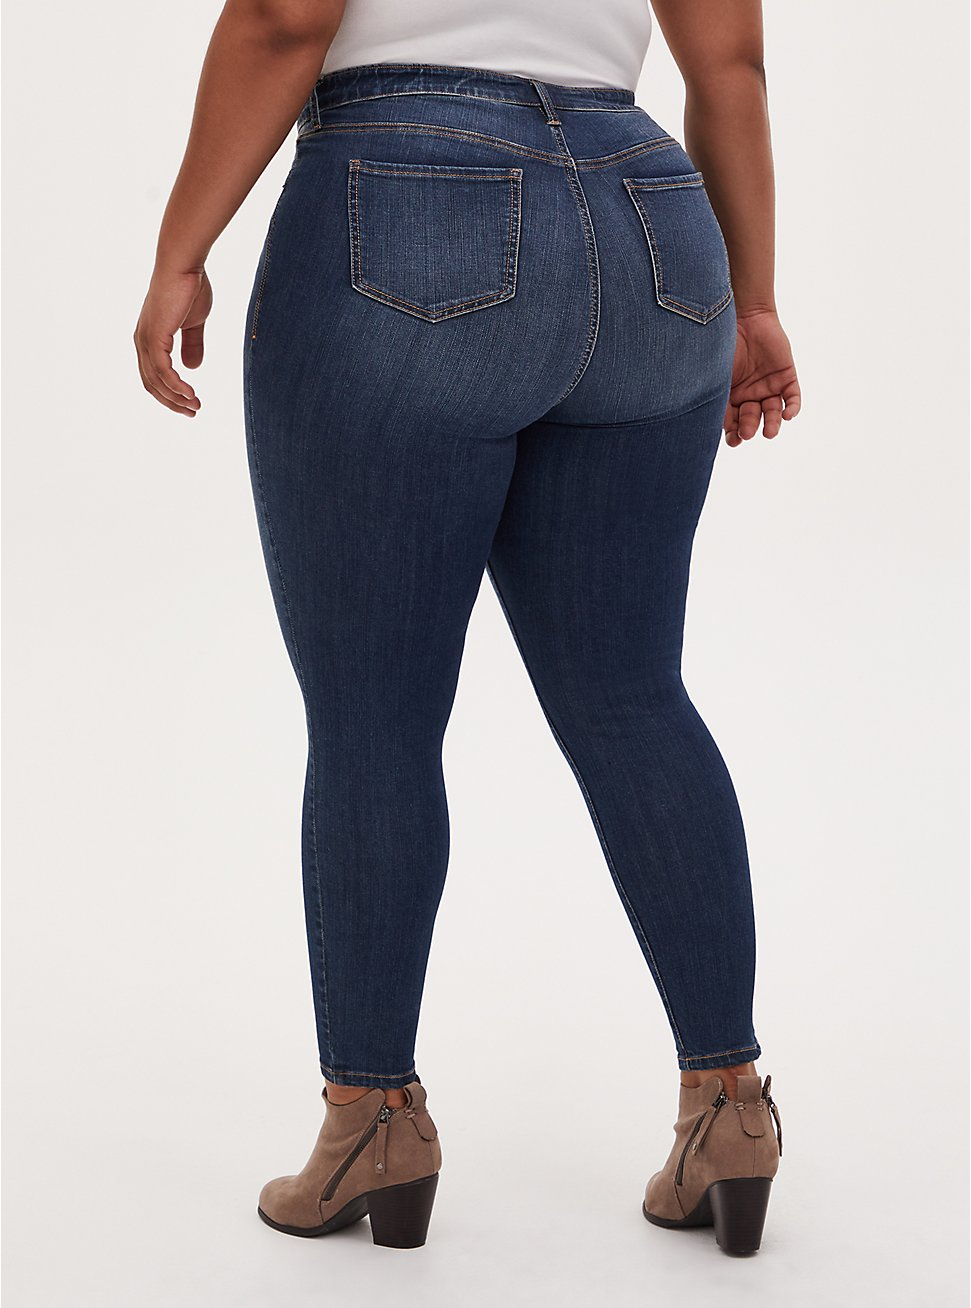 Sky High Skinny Jean - Premium Stretch Dark Wash, BLUE DREAM